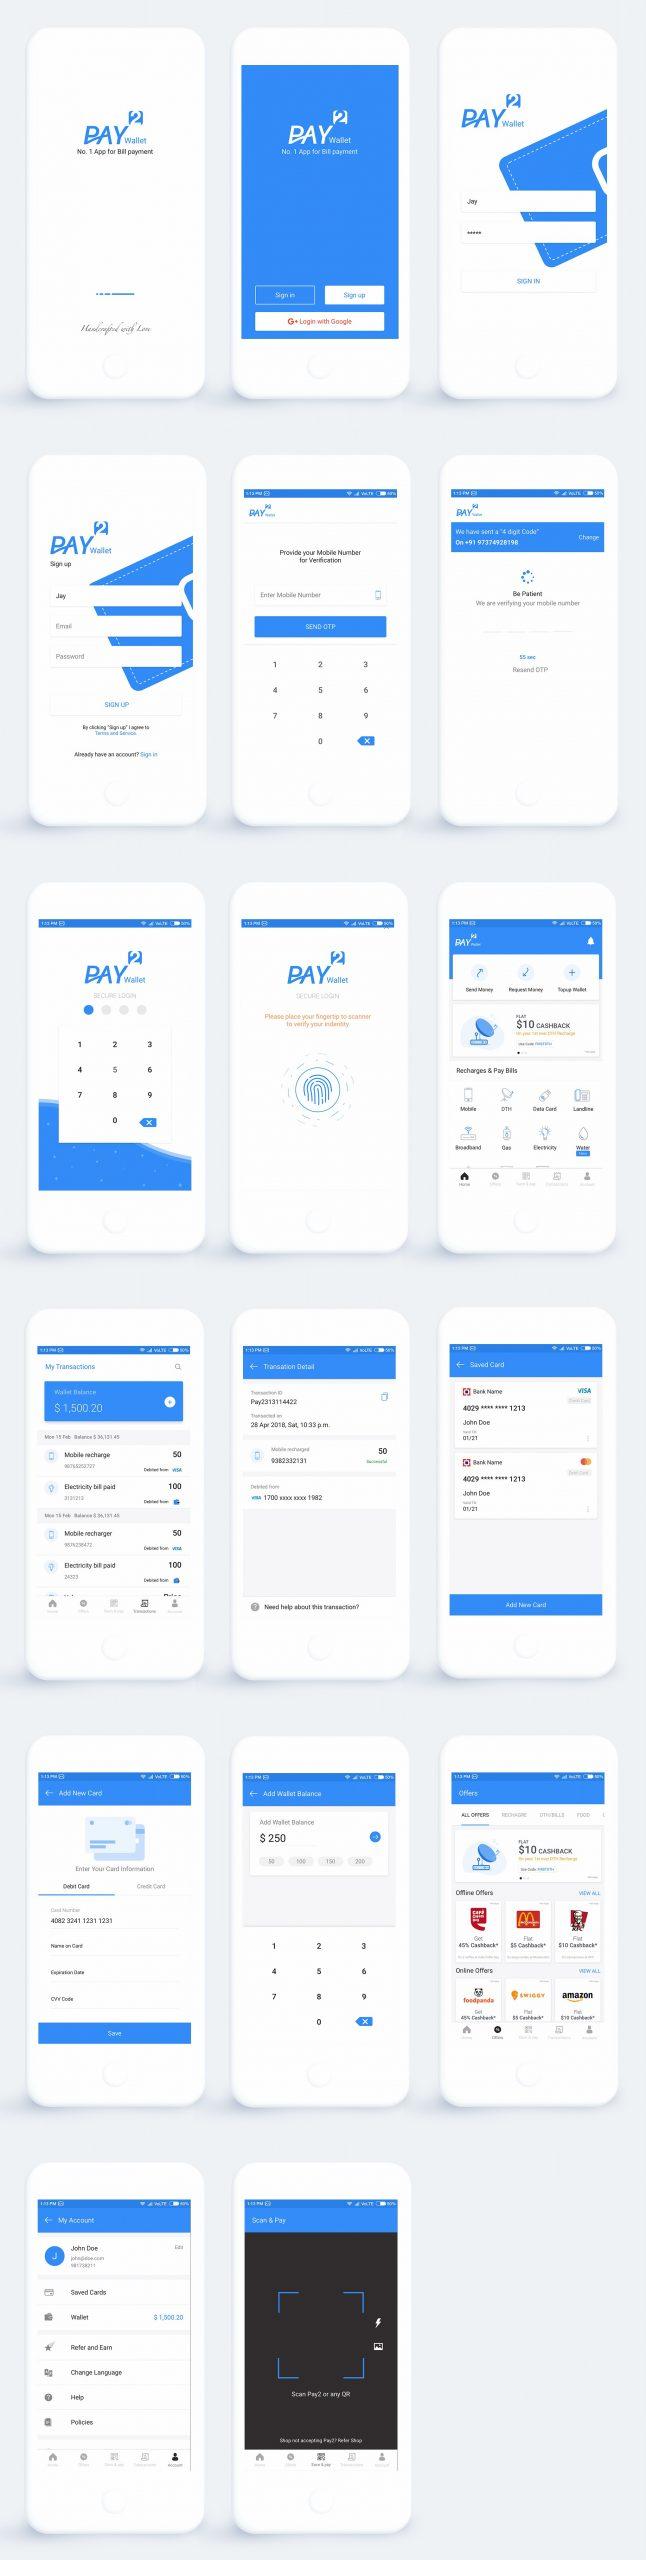 mobile-app-design-example